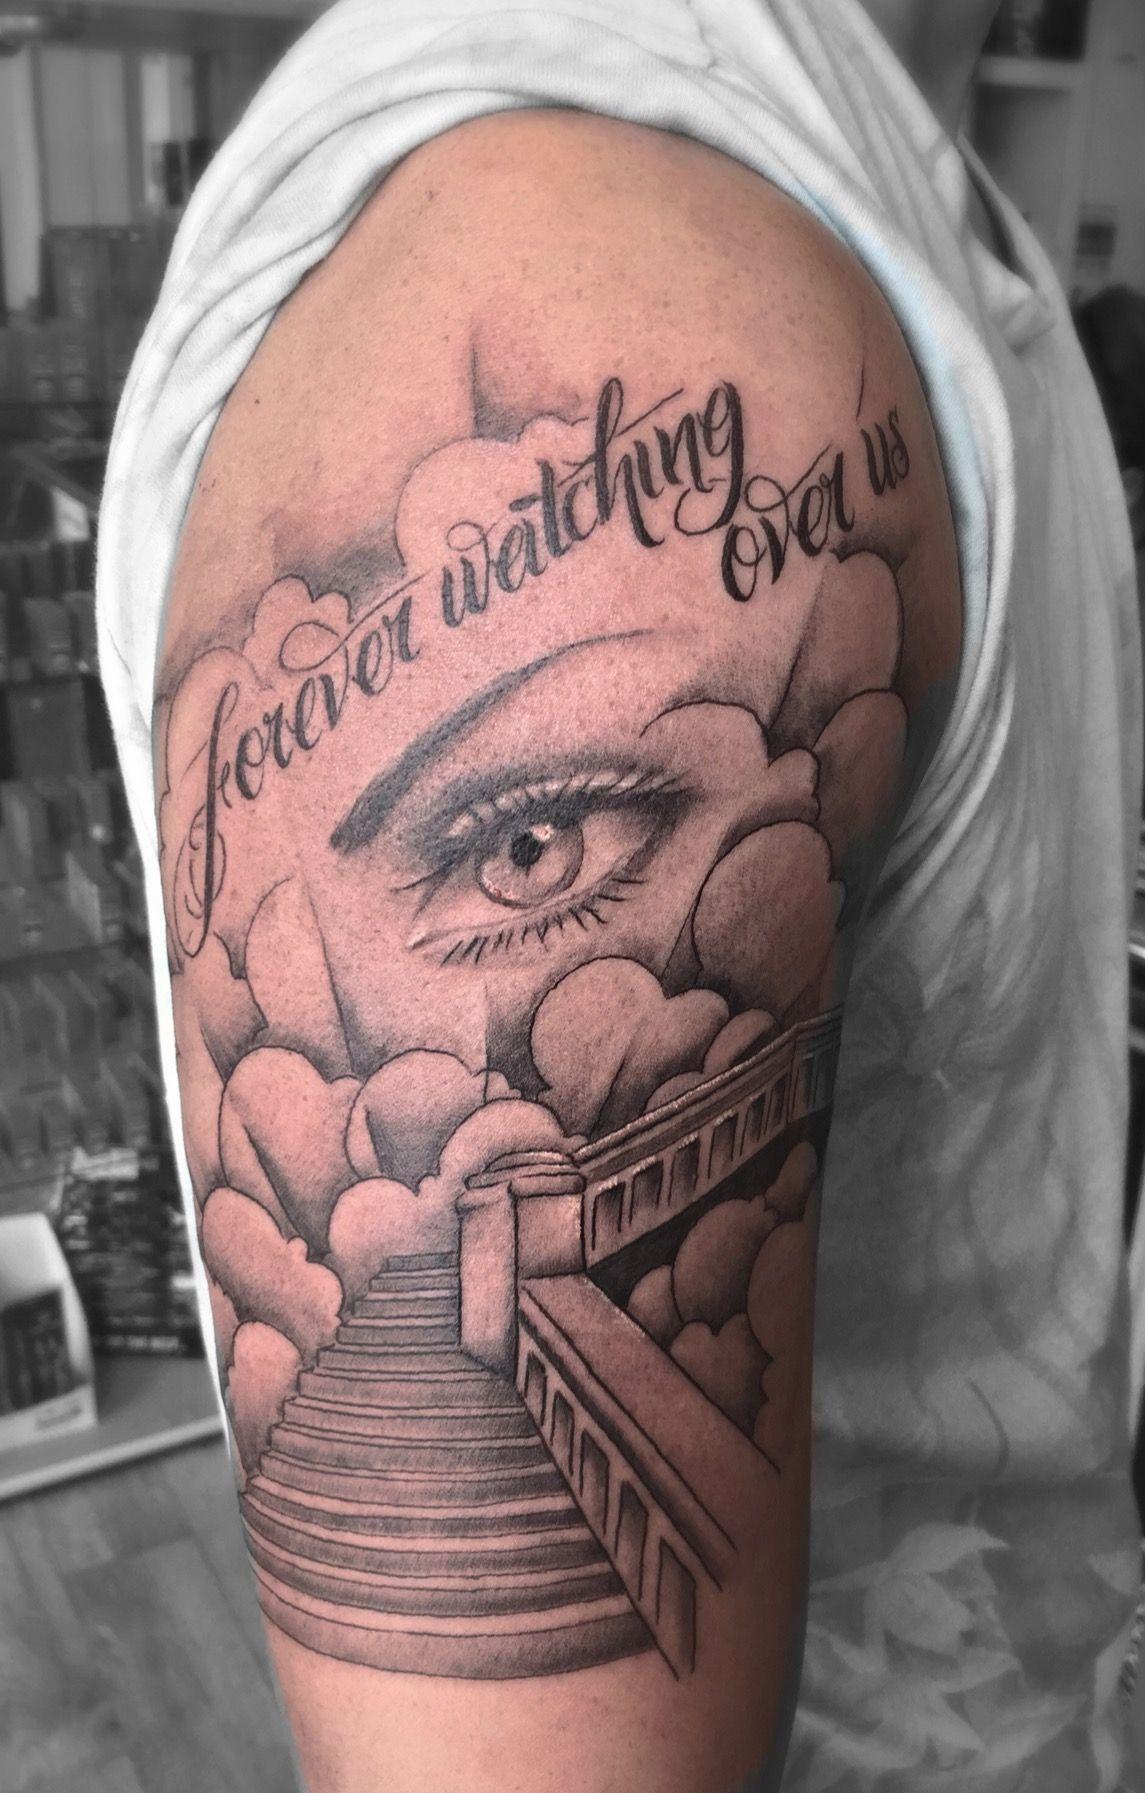 Stairway to heaven tattoo tattoo ideas pinterest for Tattoos of heaven